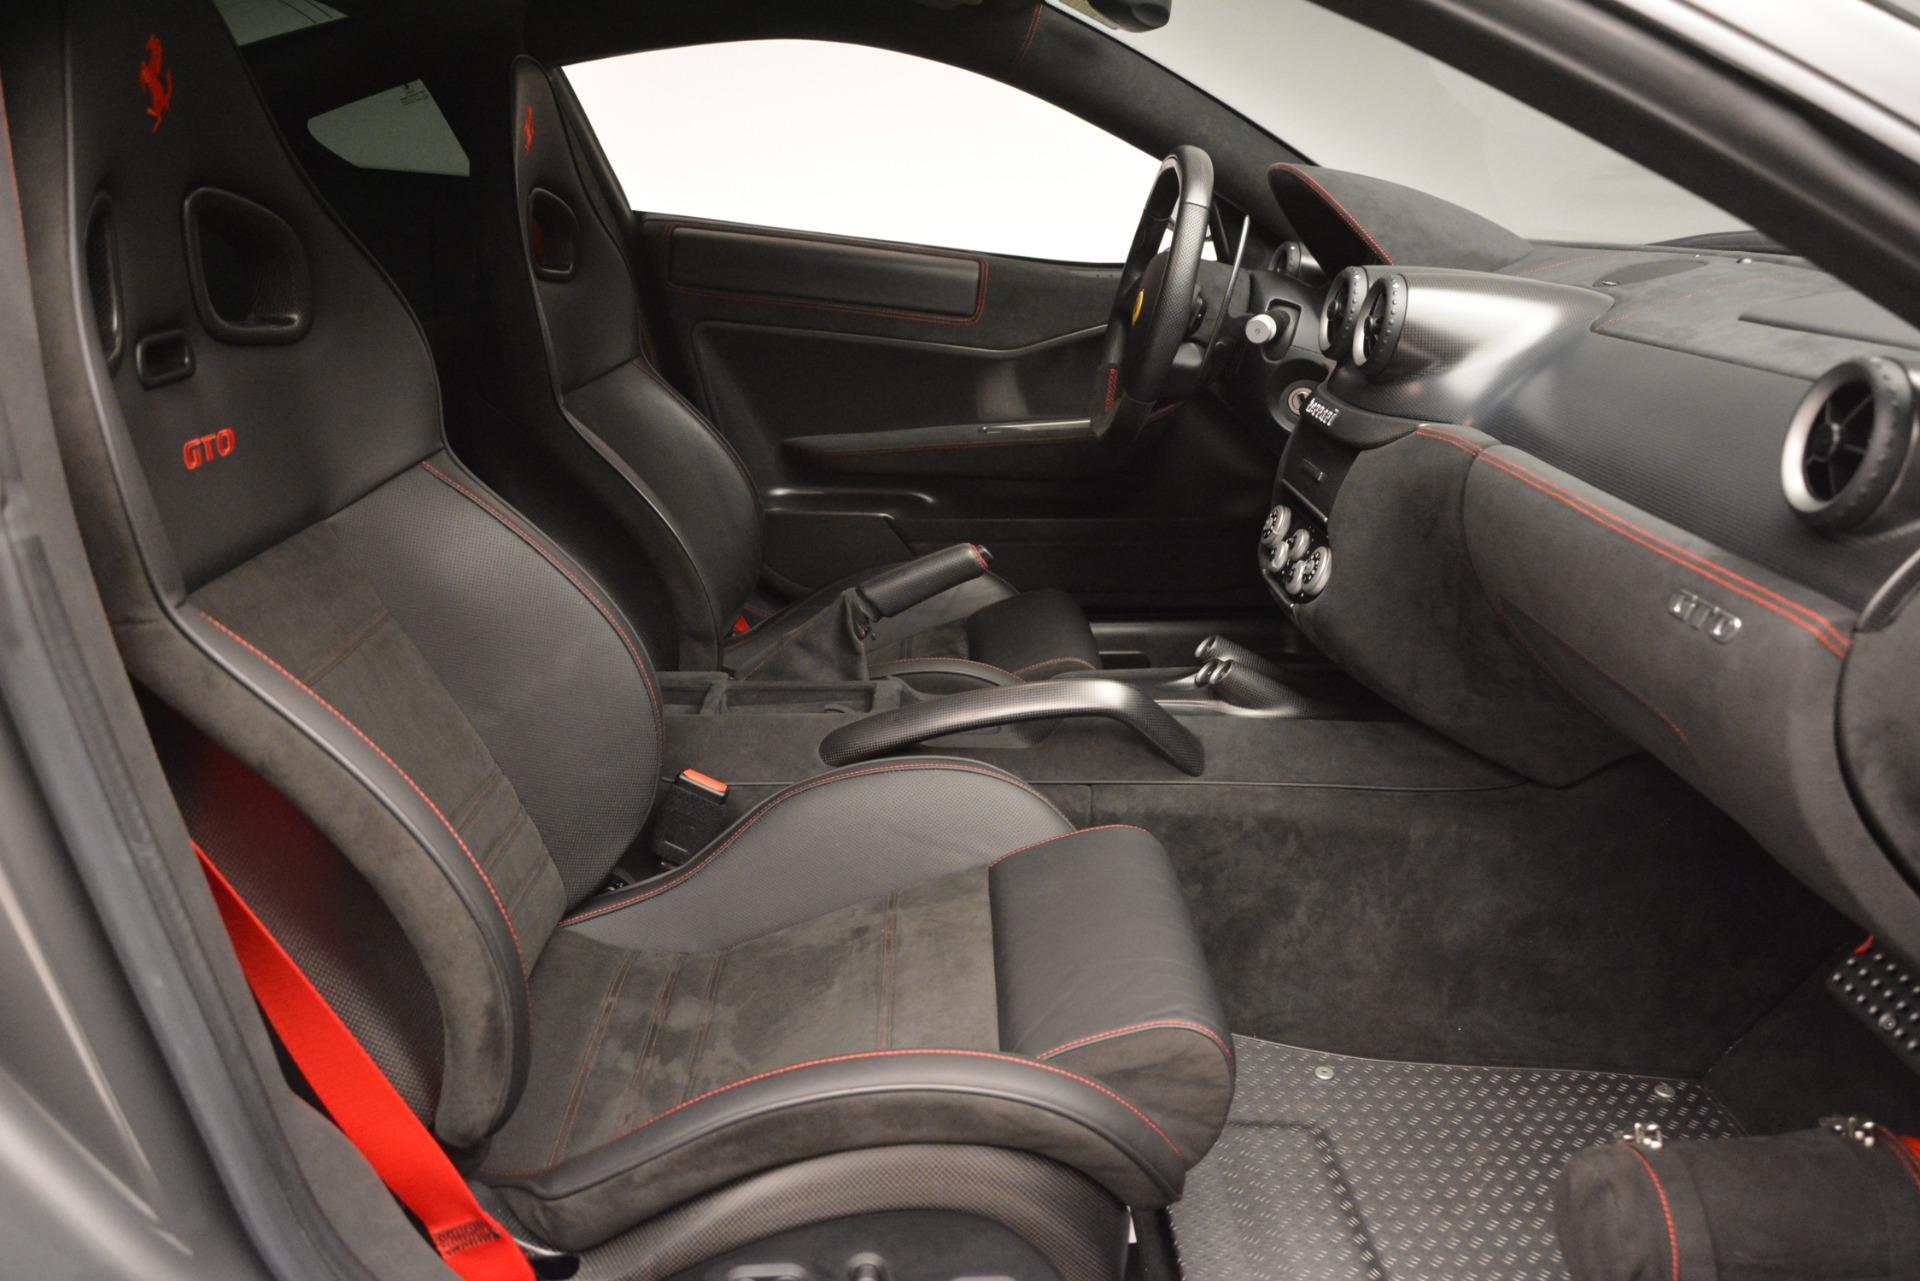 Used 2011 Ferrari 599 GTO  For Sale In Westport, CT 2724_p27